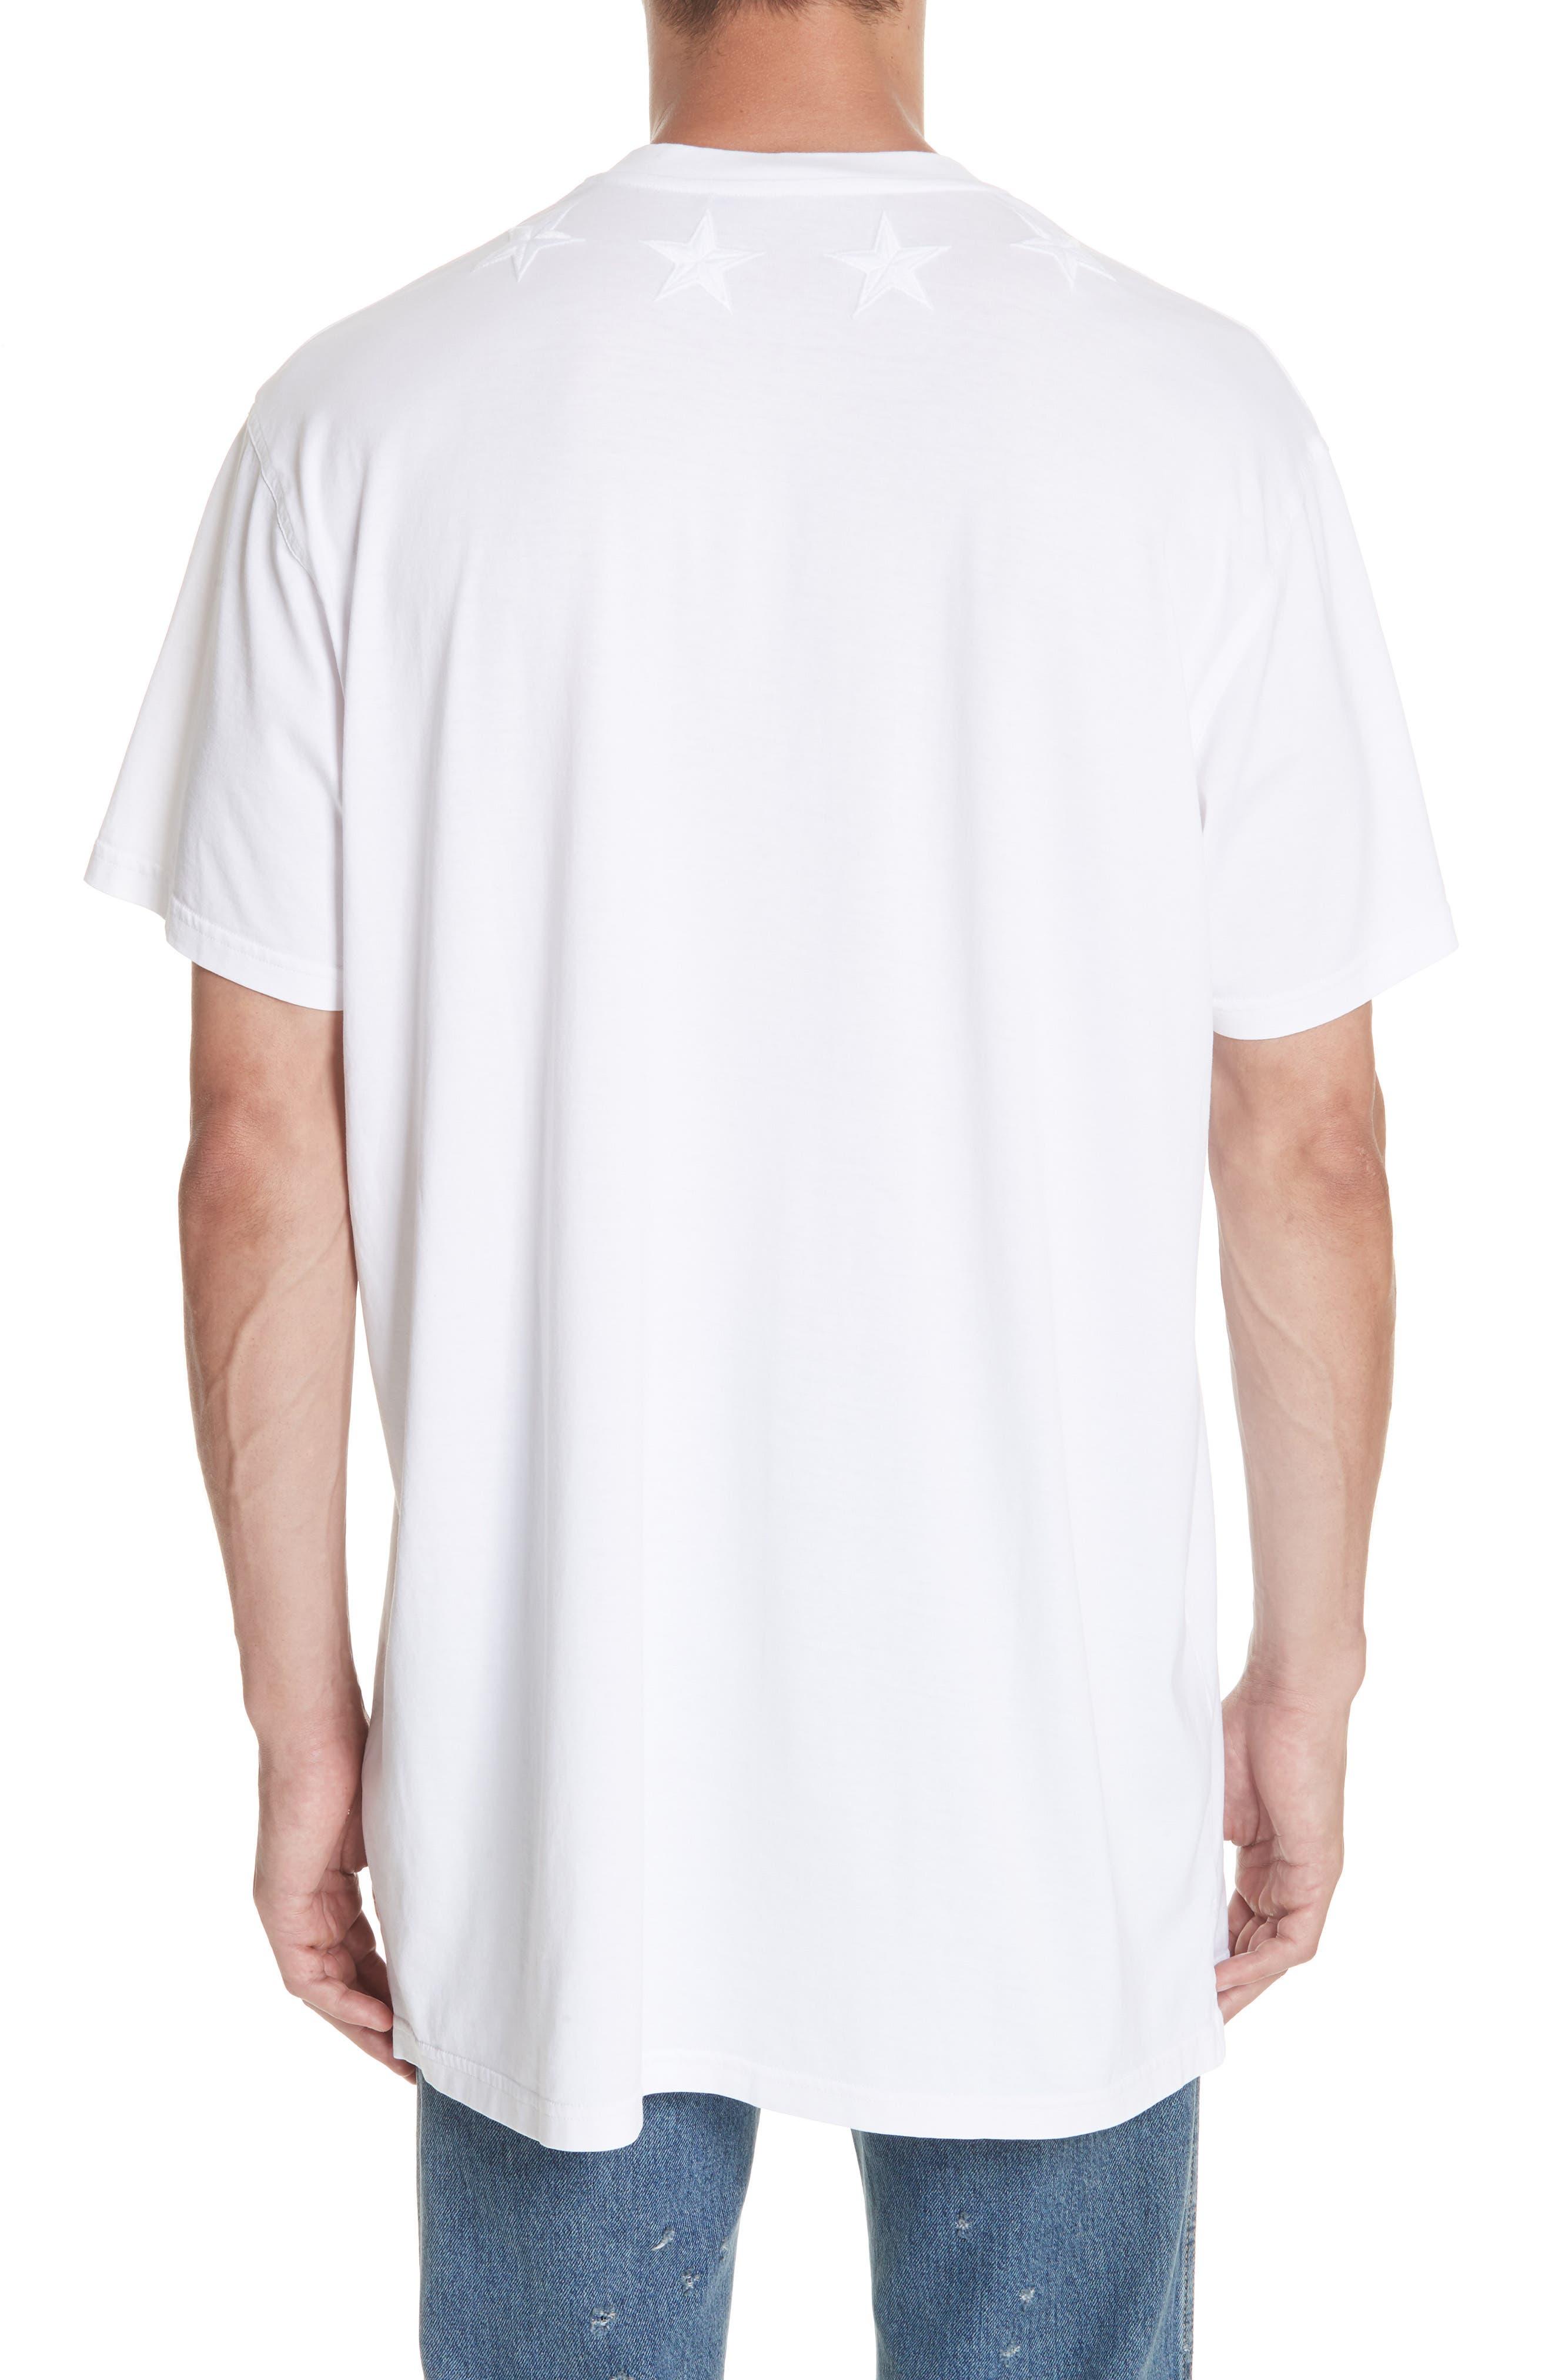 GIVENCHY,                             Star Appliqué T-Shirt,                             Alternate thumbnail 2, color,                             WHITE